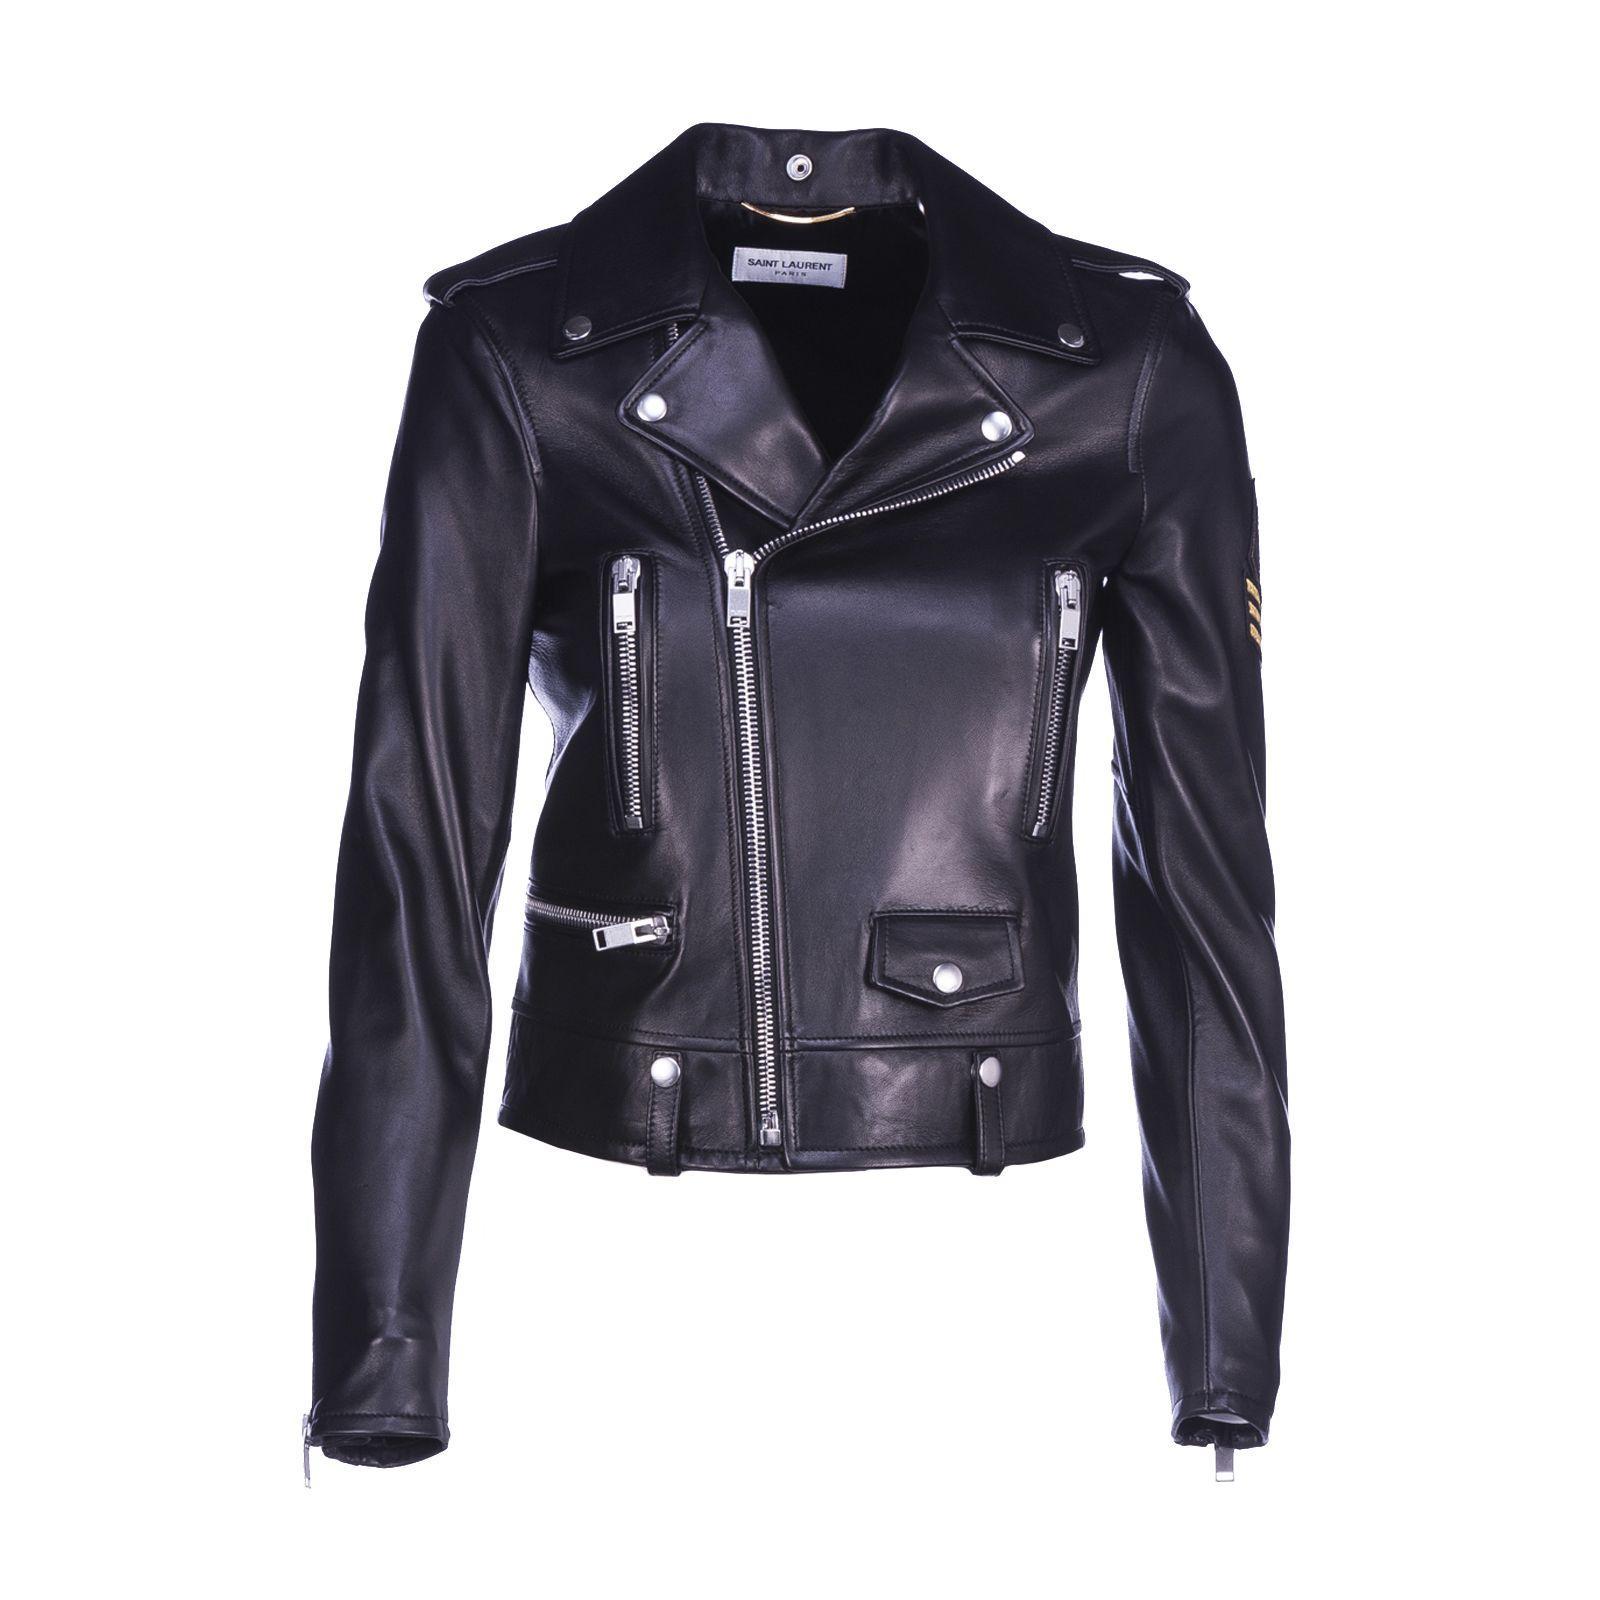 Saint Laurent Embroidered Patch Biker Jacket In Black